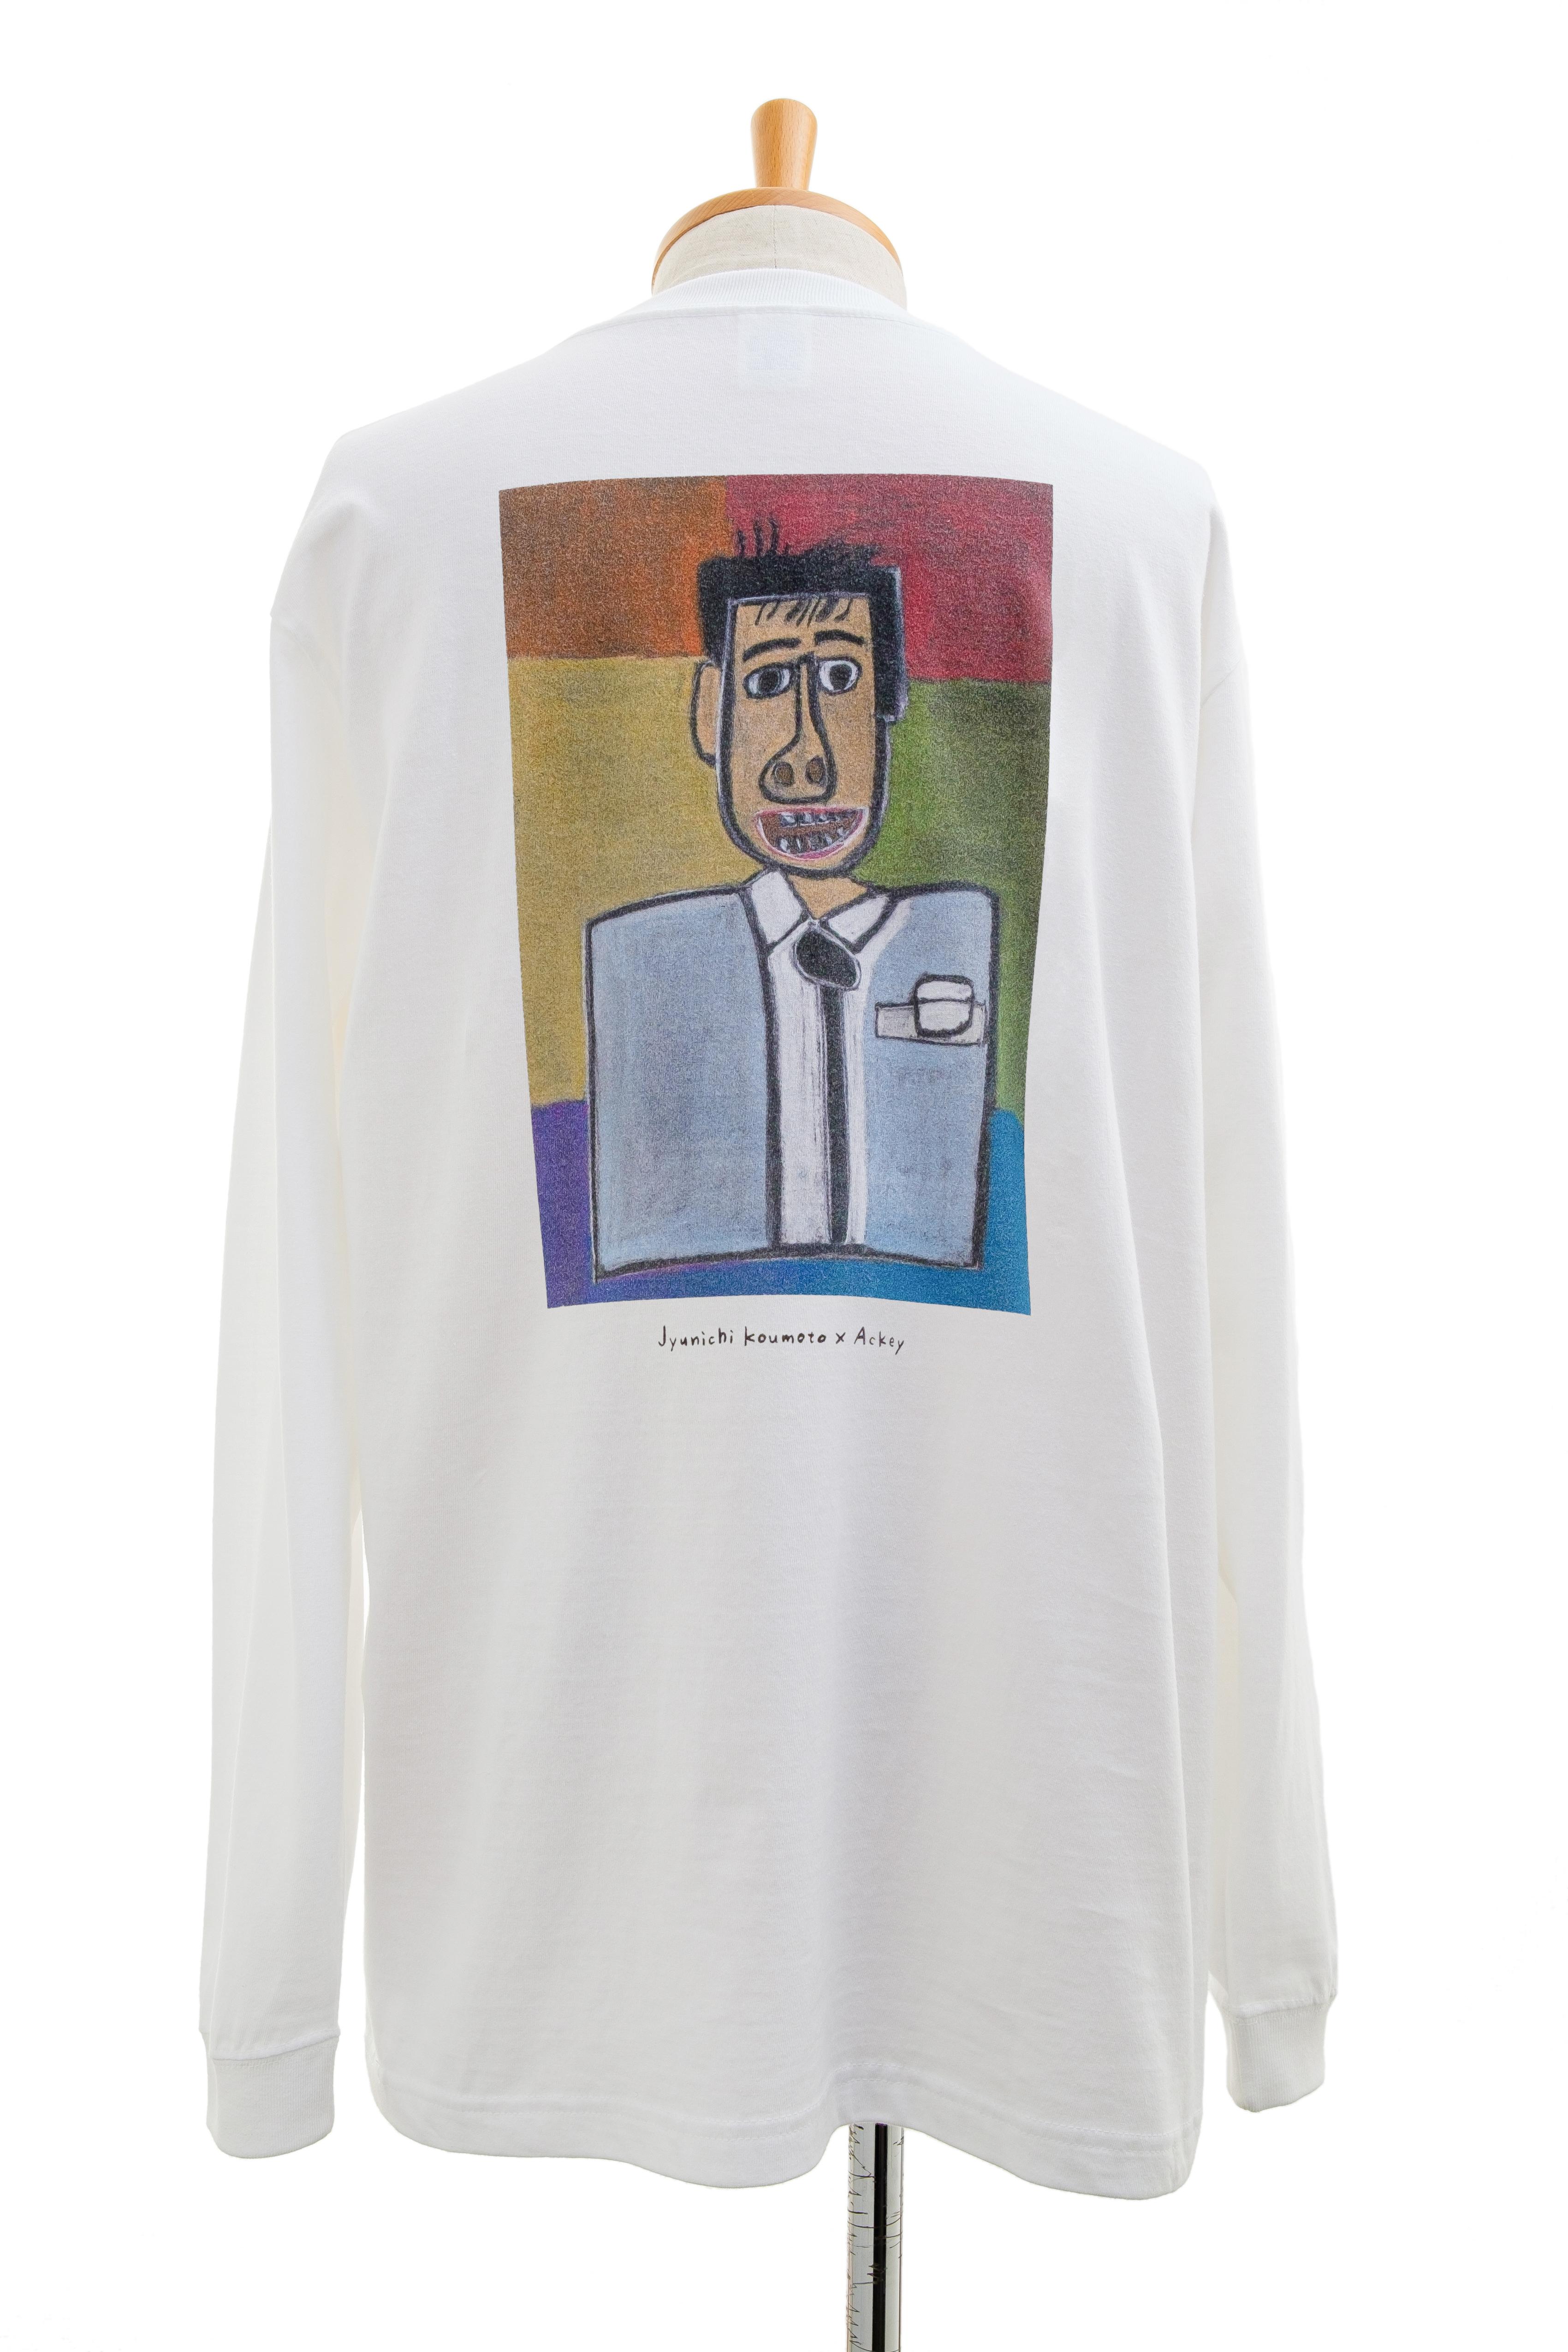 【Junichi Koumoto × Ackey】ロングスリーブTシャツ ホワイト